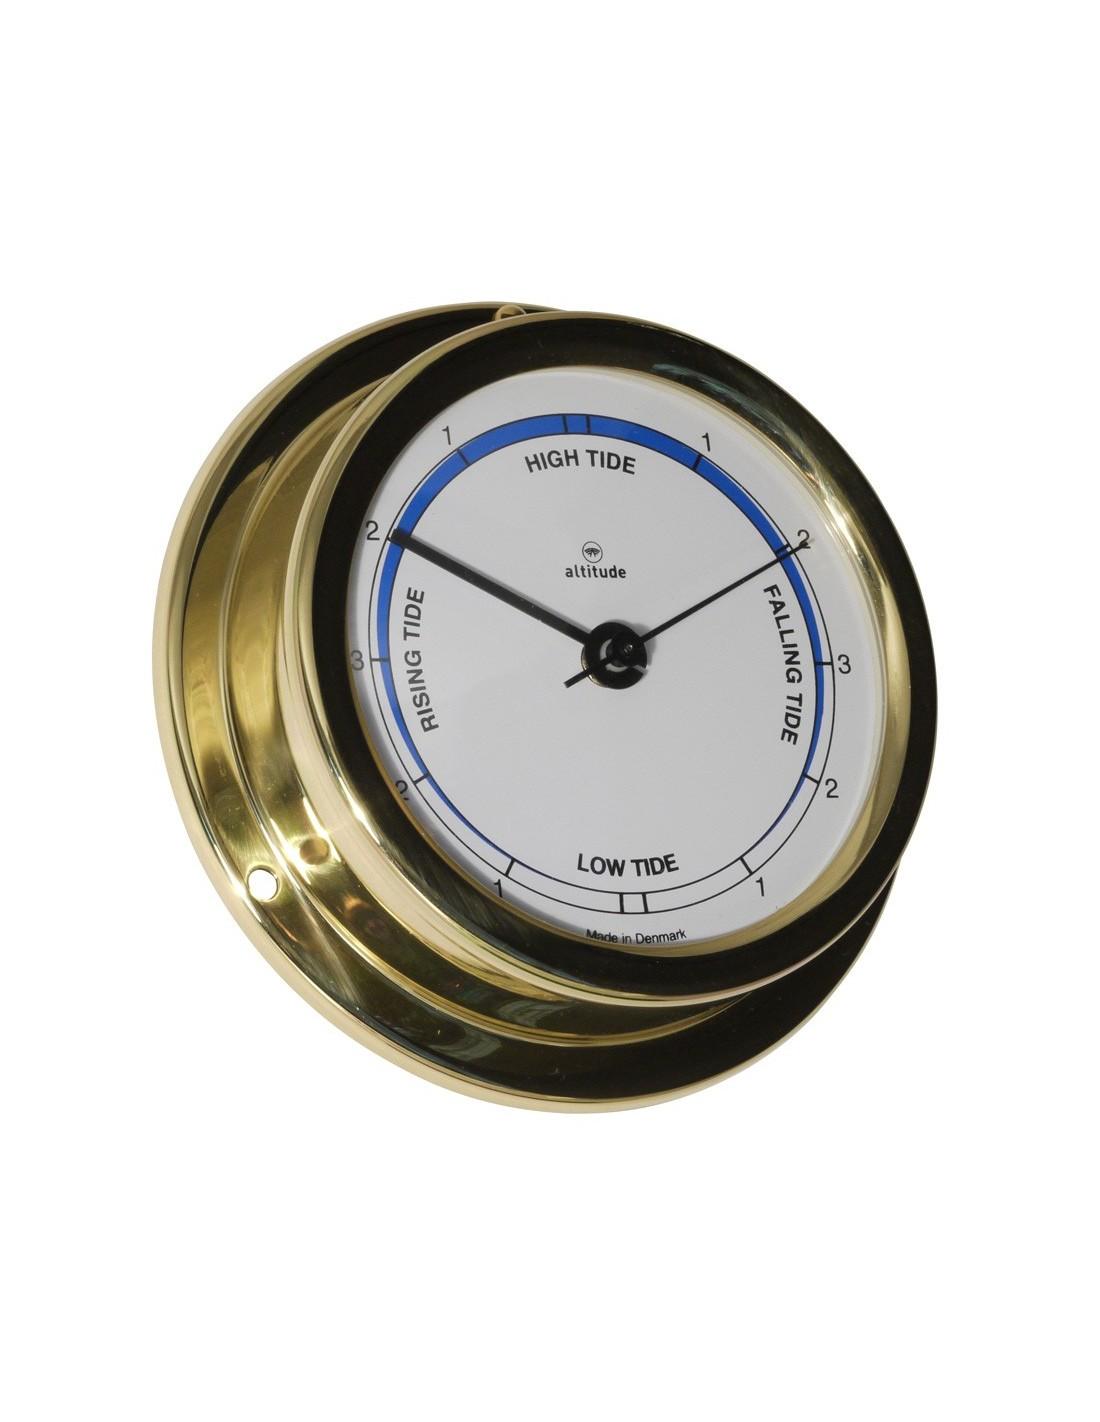 Getijdenklok - 127 mm - Engels - Altitude - Scheepsinstrumenten - 858 IM UK